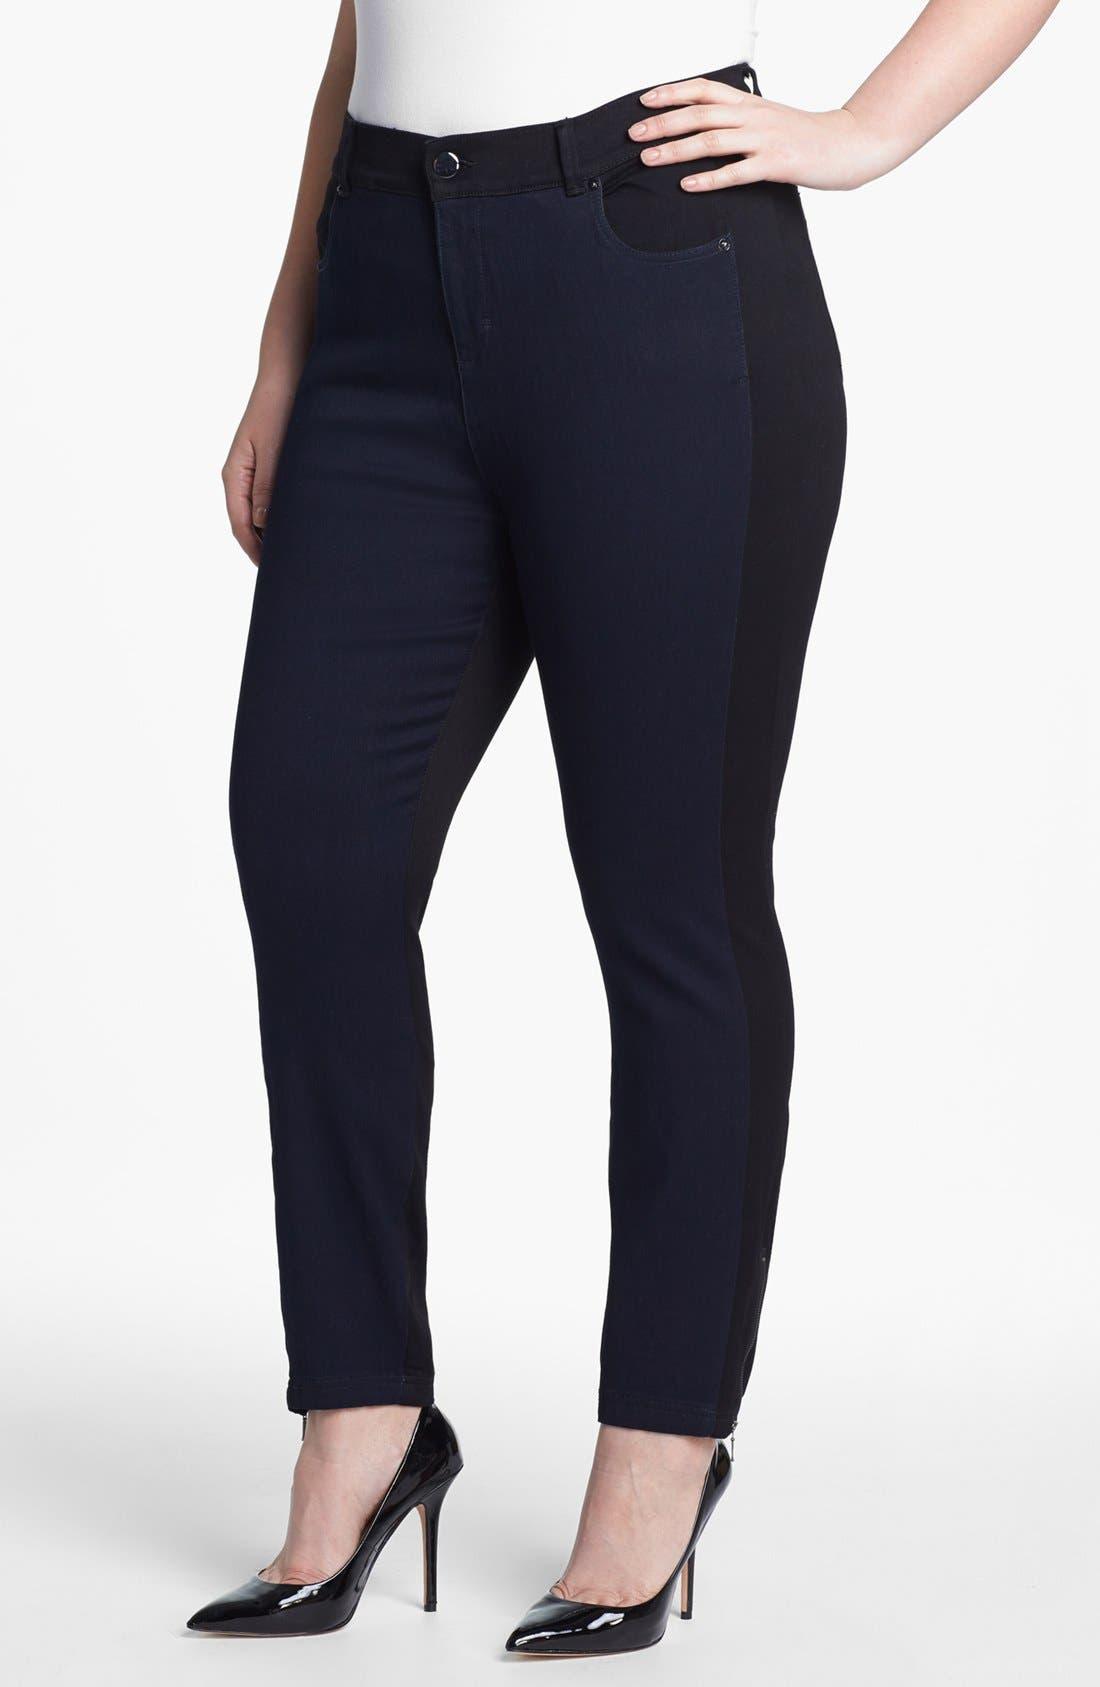 Alternate Image 1 Selected - Evans Colorblock Skinny Jeans (Plus Size)